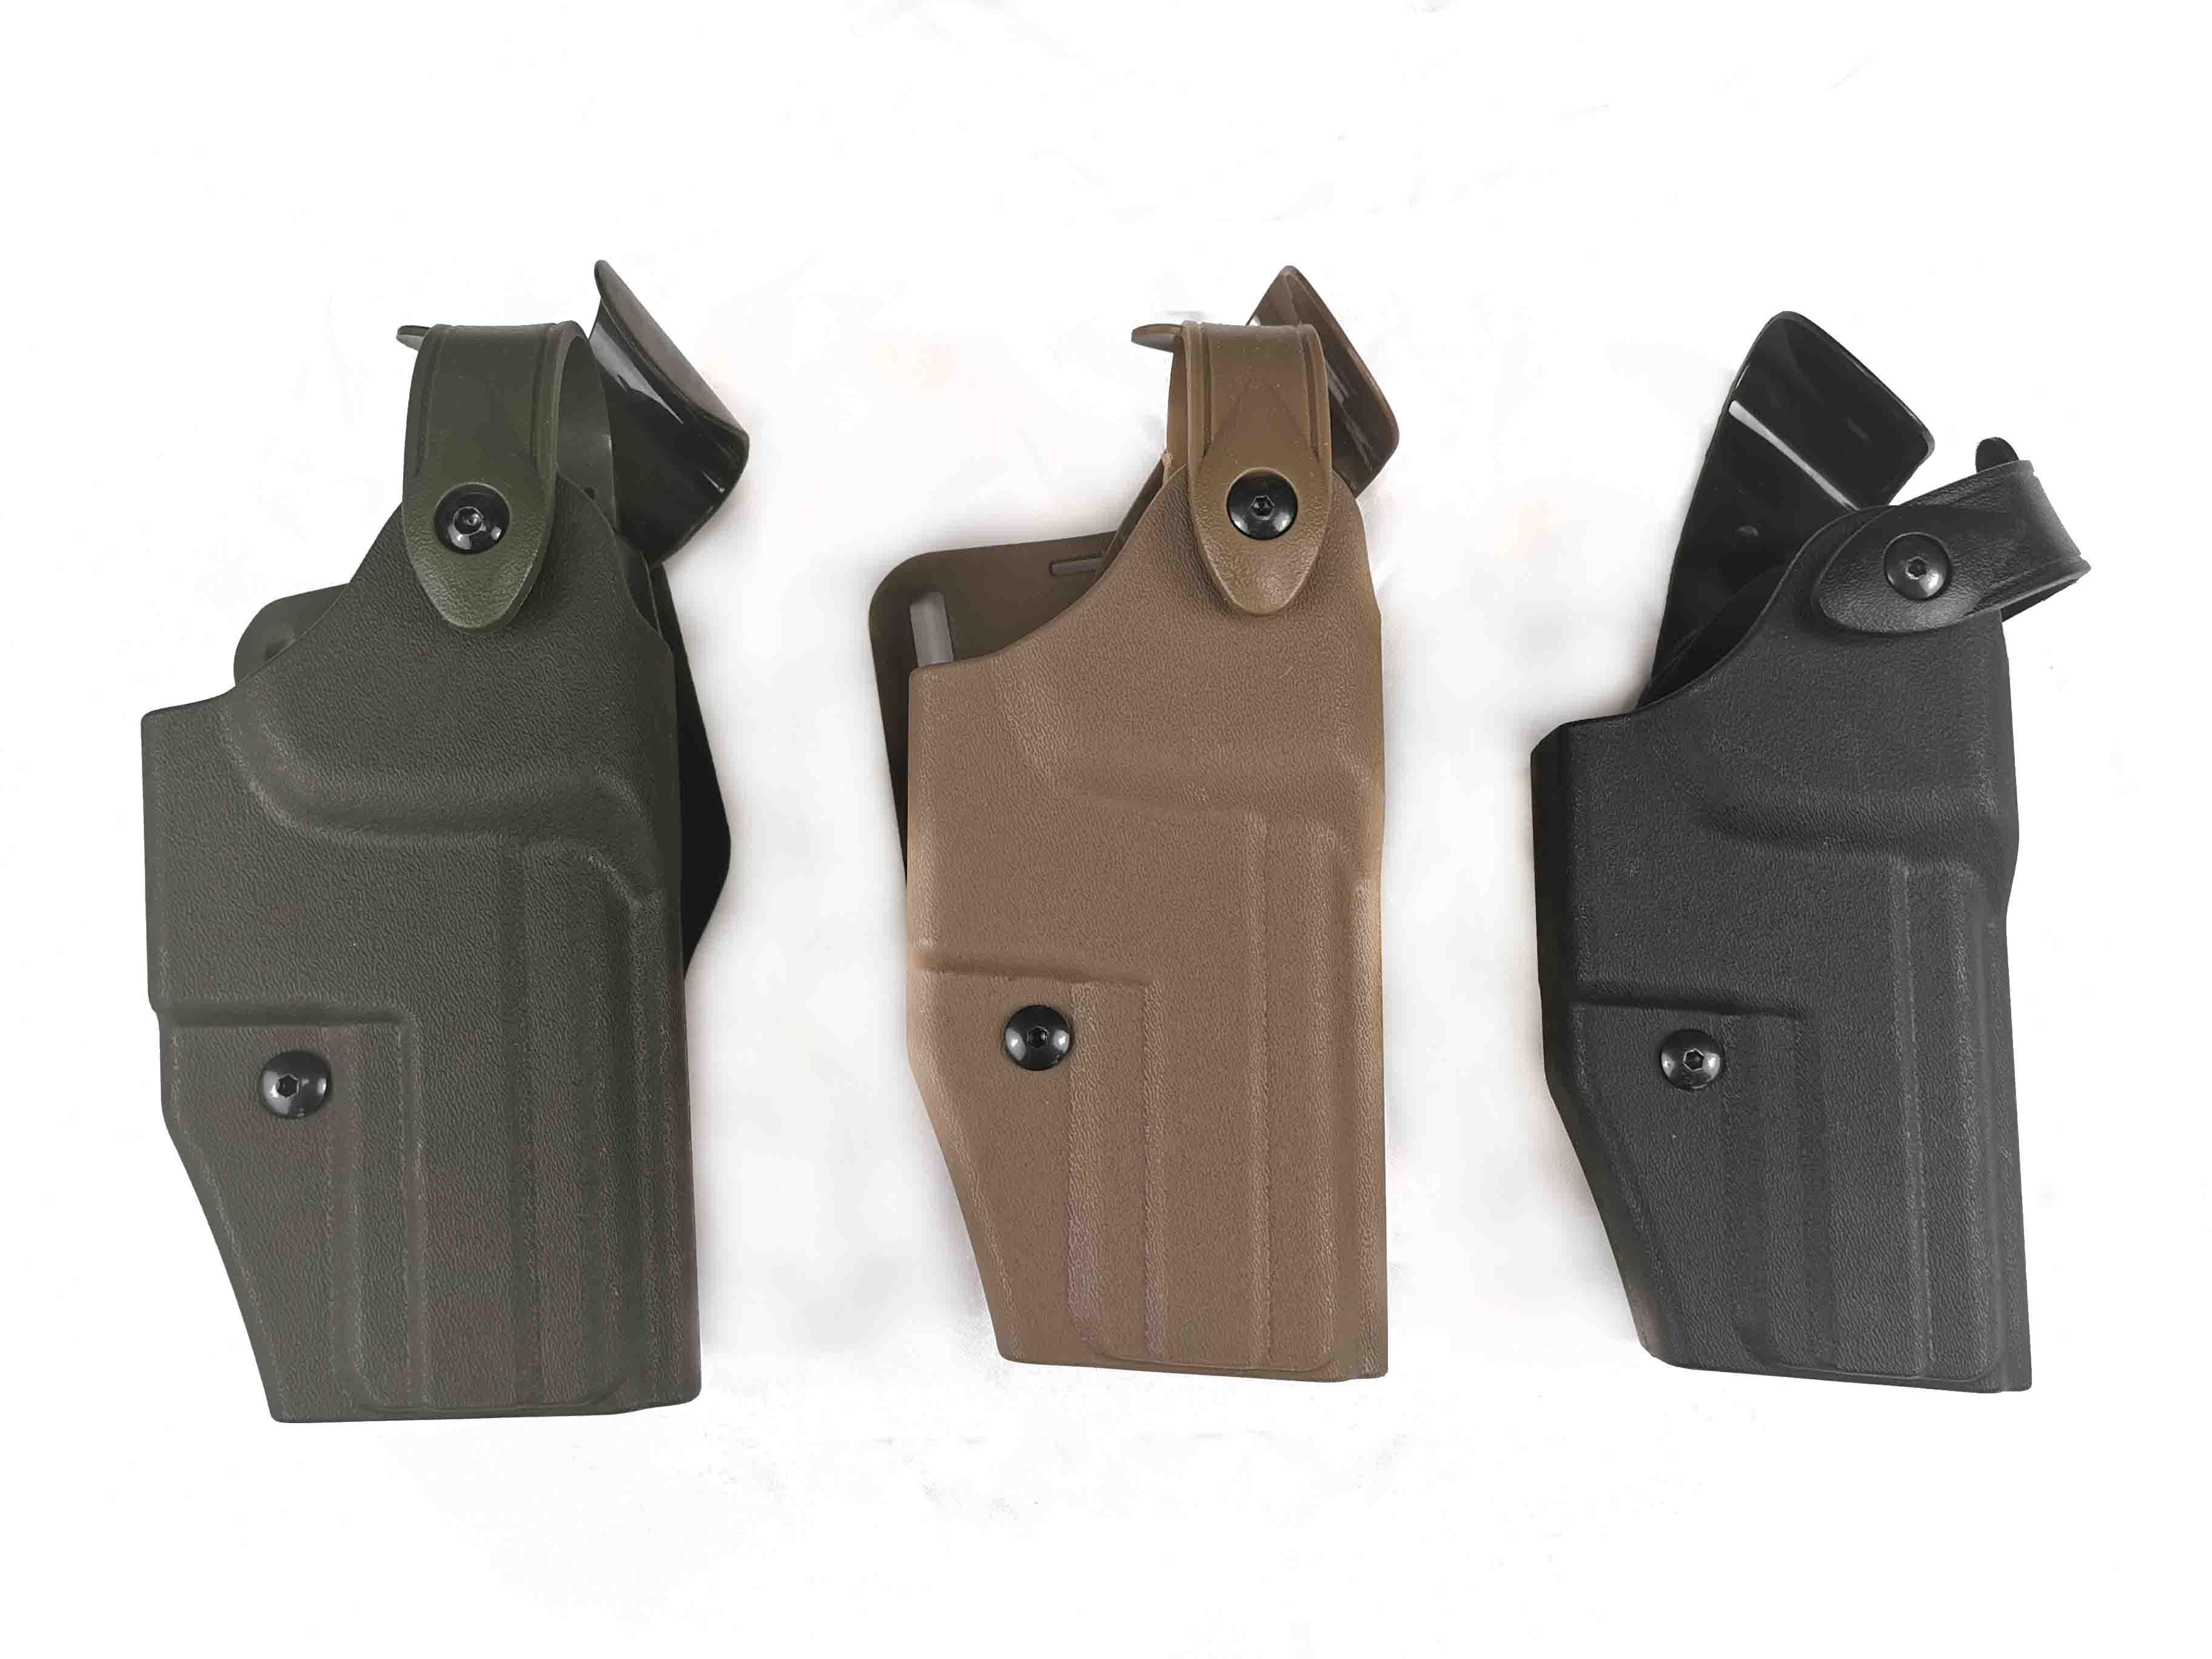 Tactical Safariland 6320 Waist Belt Holster For Army Hunting USP Pistol Military Gear Gun Holster Black/Tan